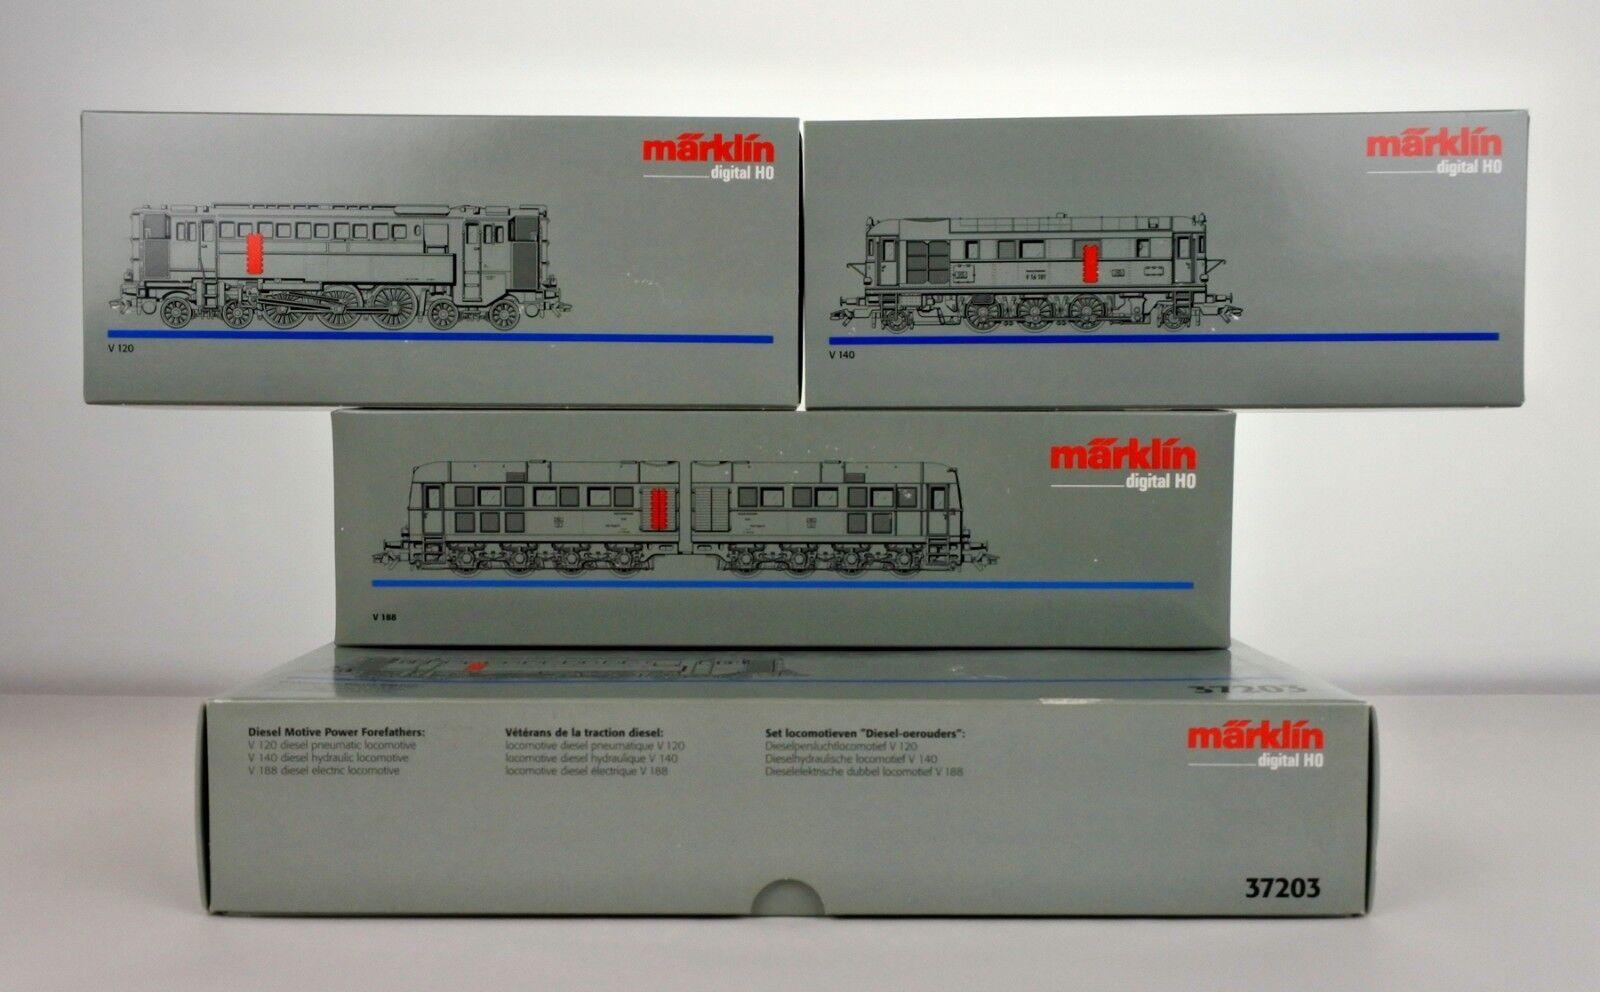 MARKLIN SCALA HO 37203 DRG Digitale specialee motore Diesel 3 Set